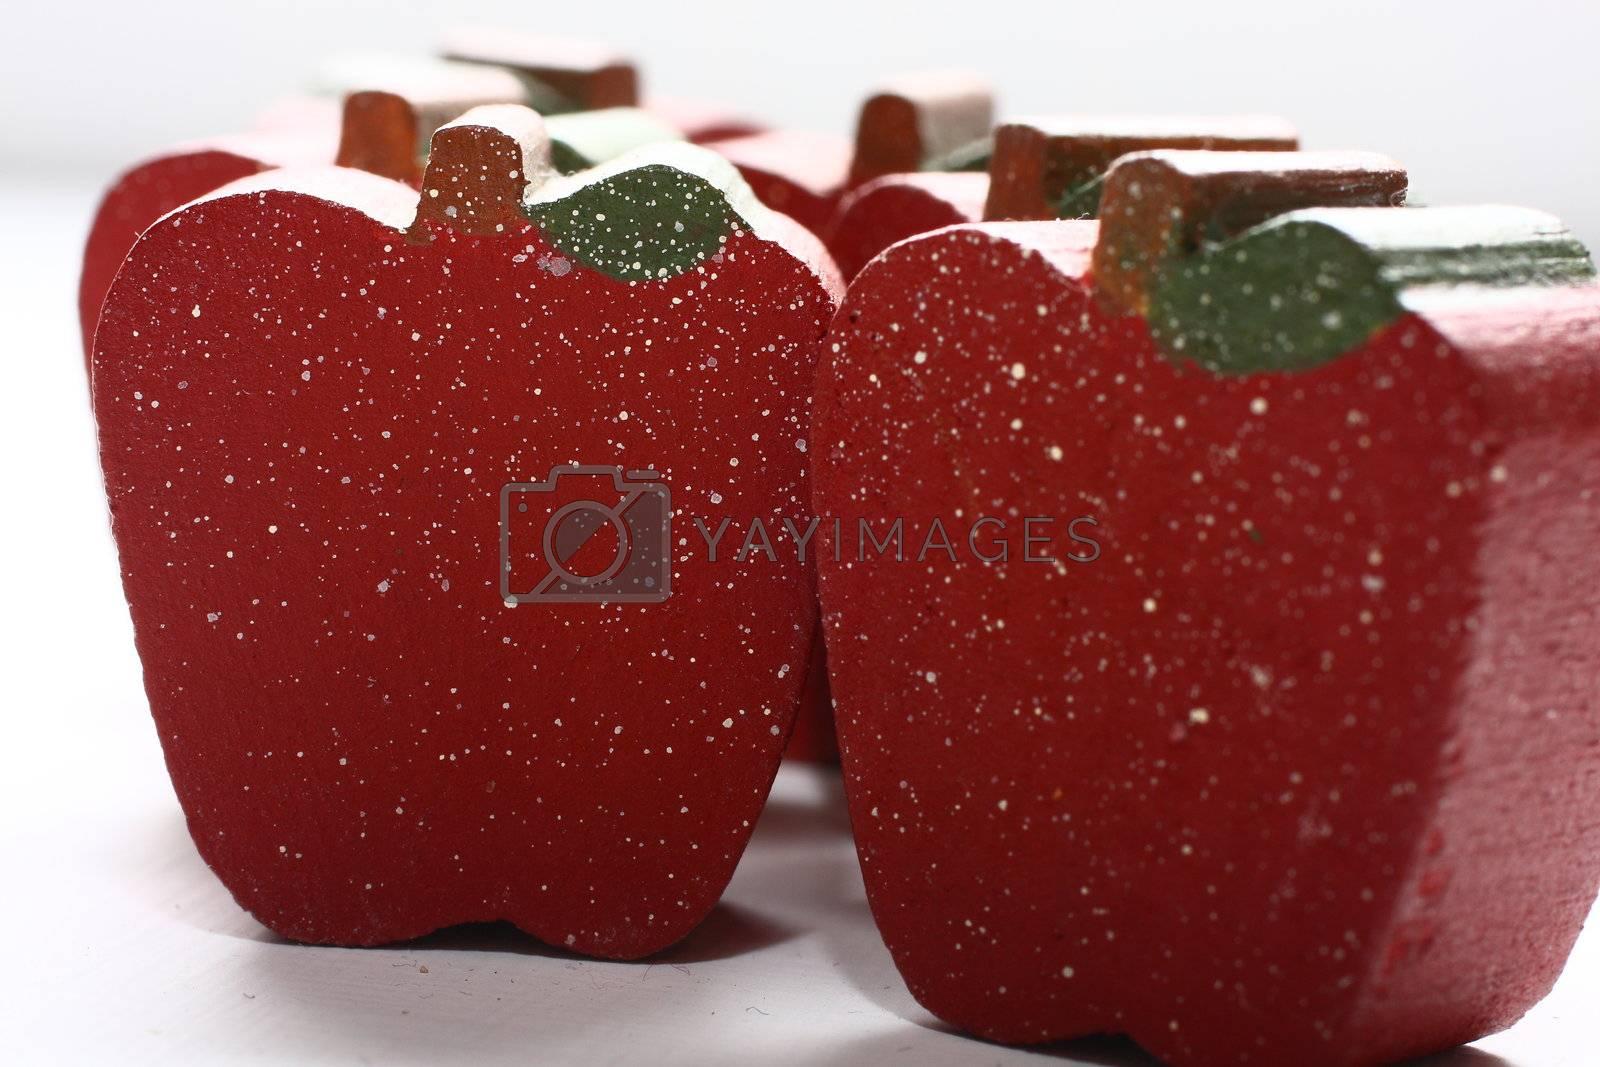 Wooden Apples by dersankt